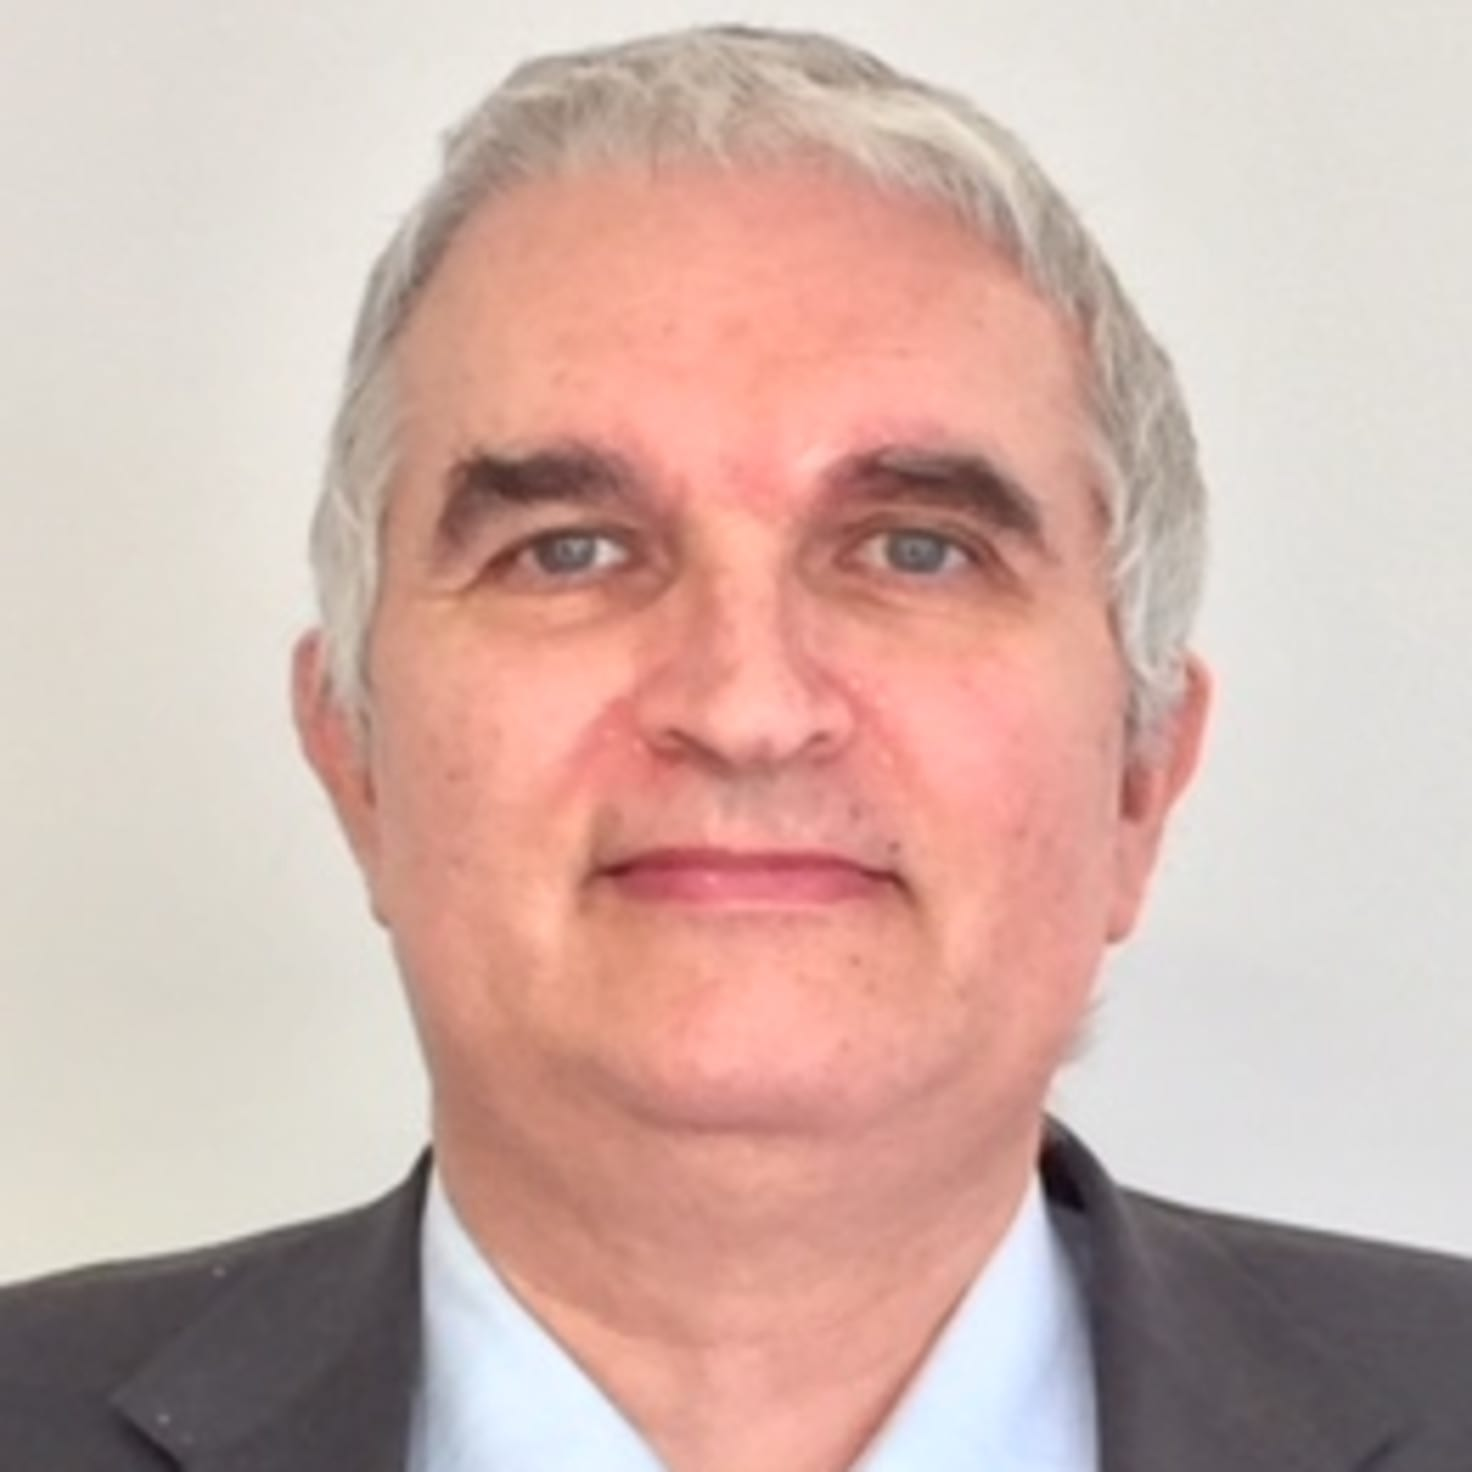 SERGIO GUSMEROLI